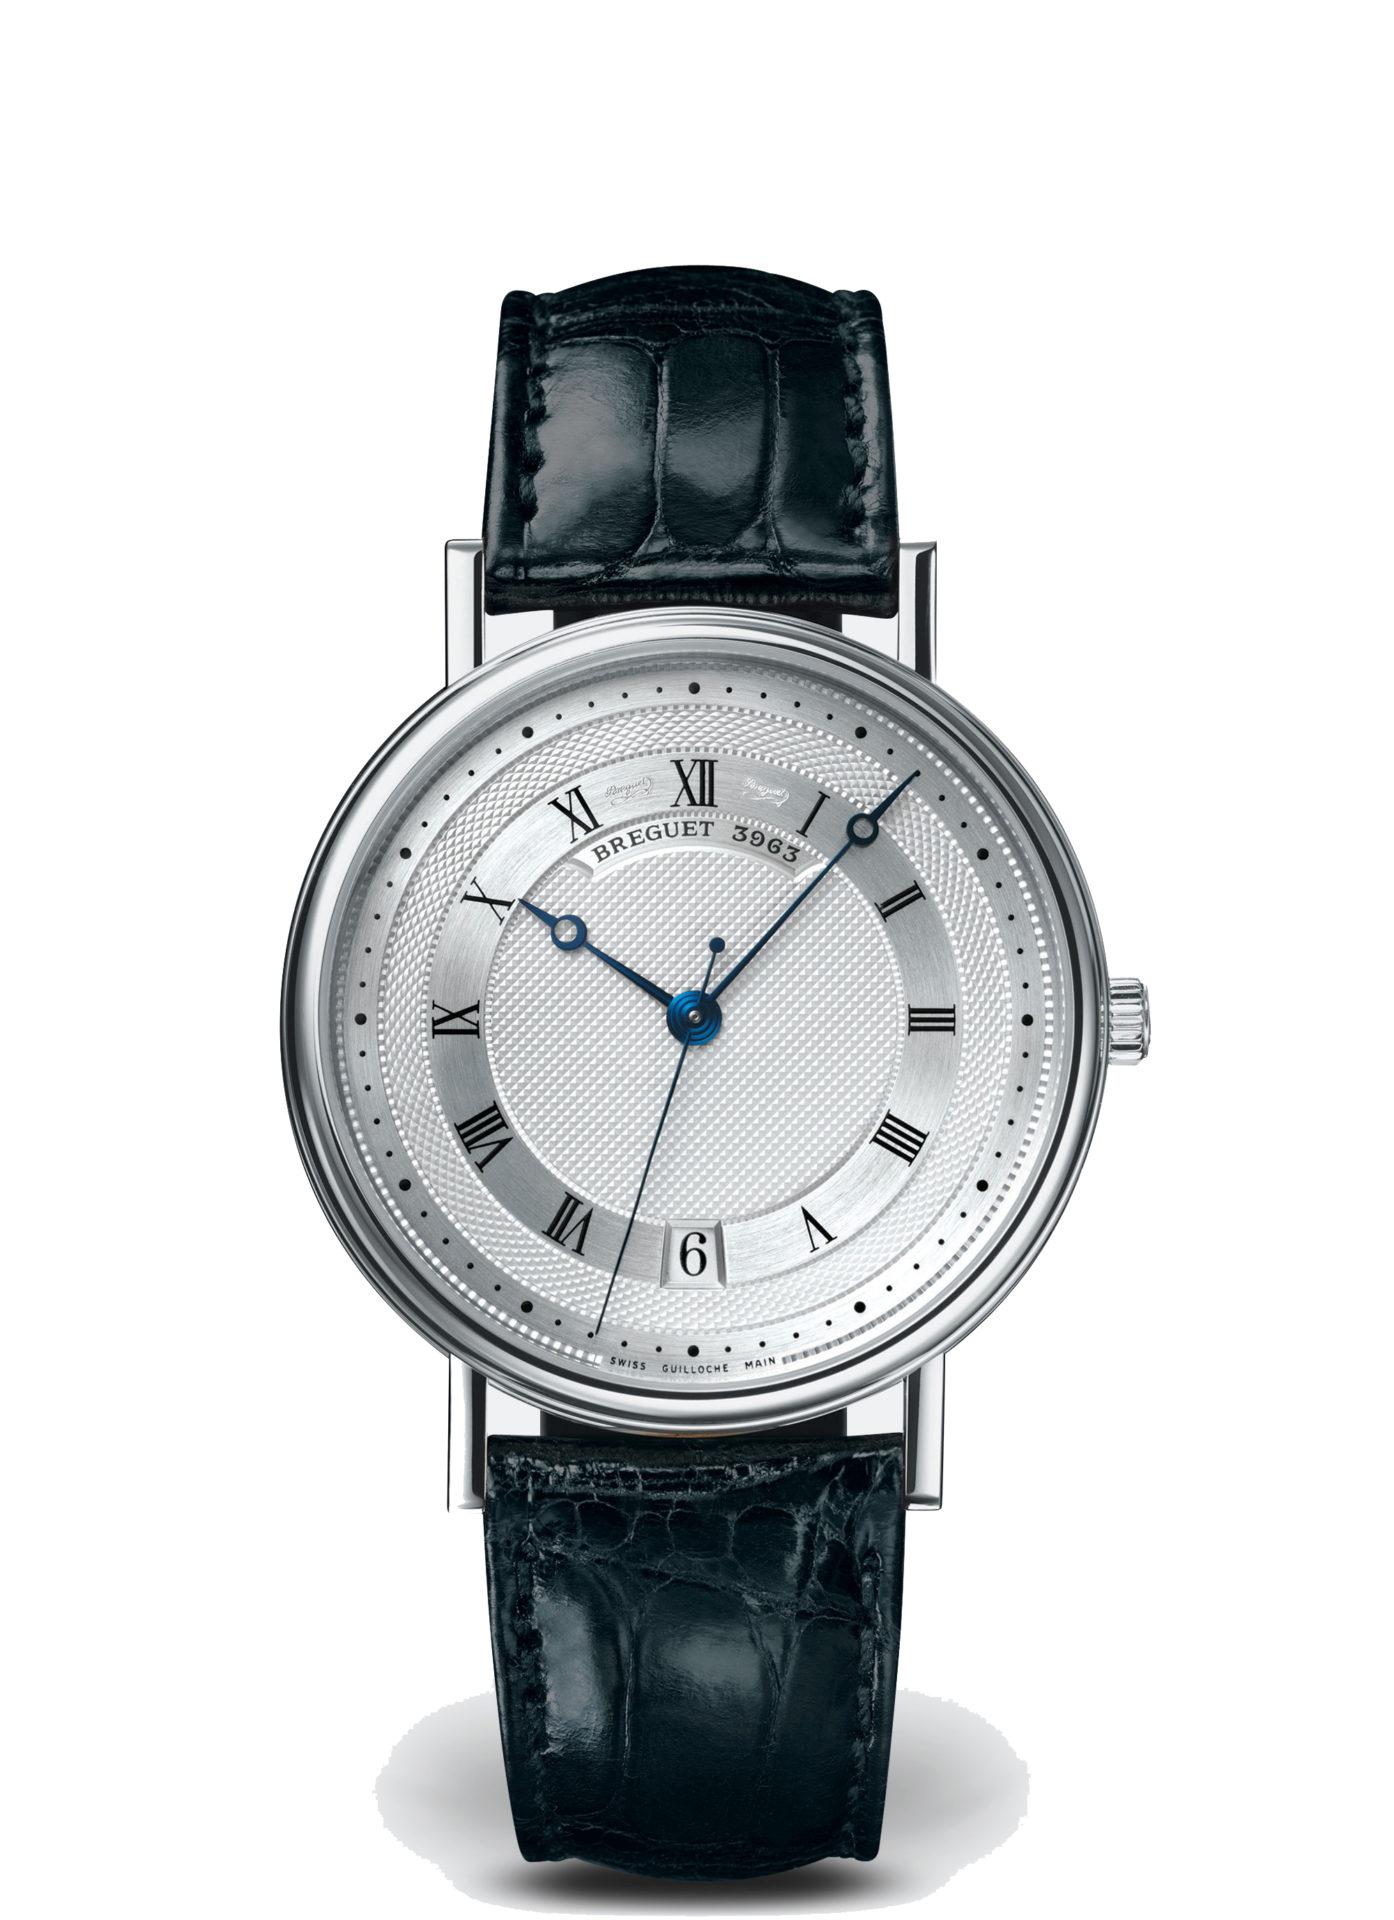 Breguet-Classique-5930-Hall-of-Time-5930bb-12-986-0 copie